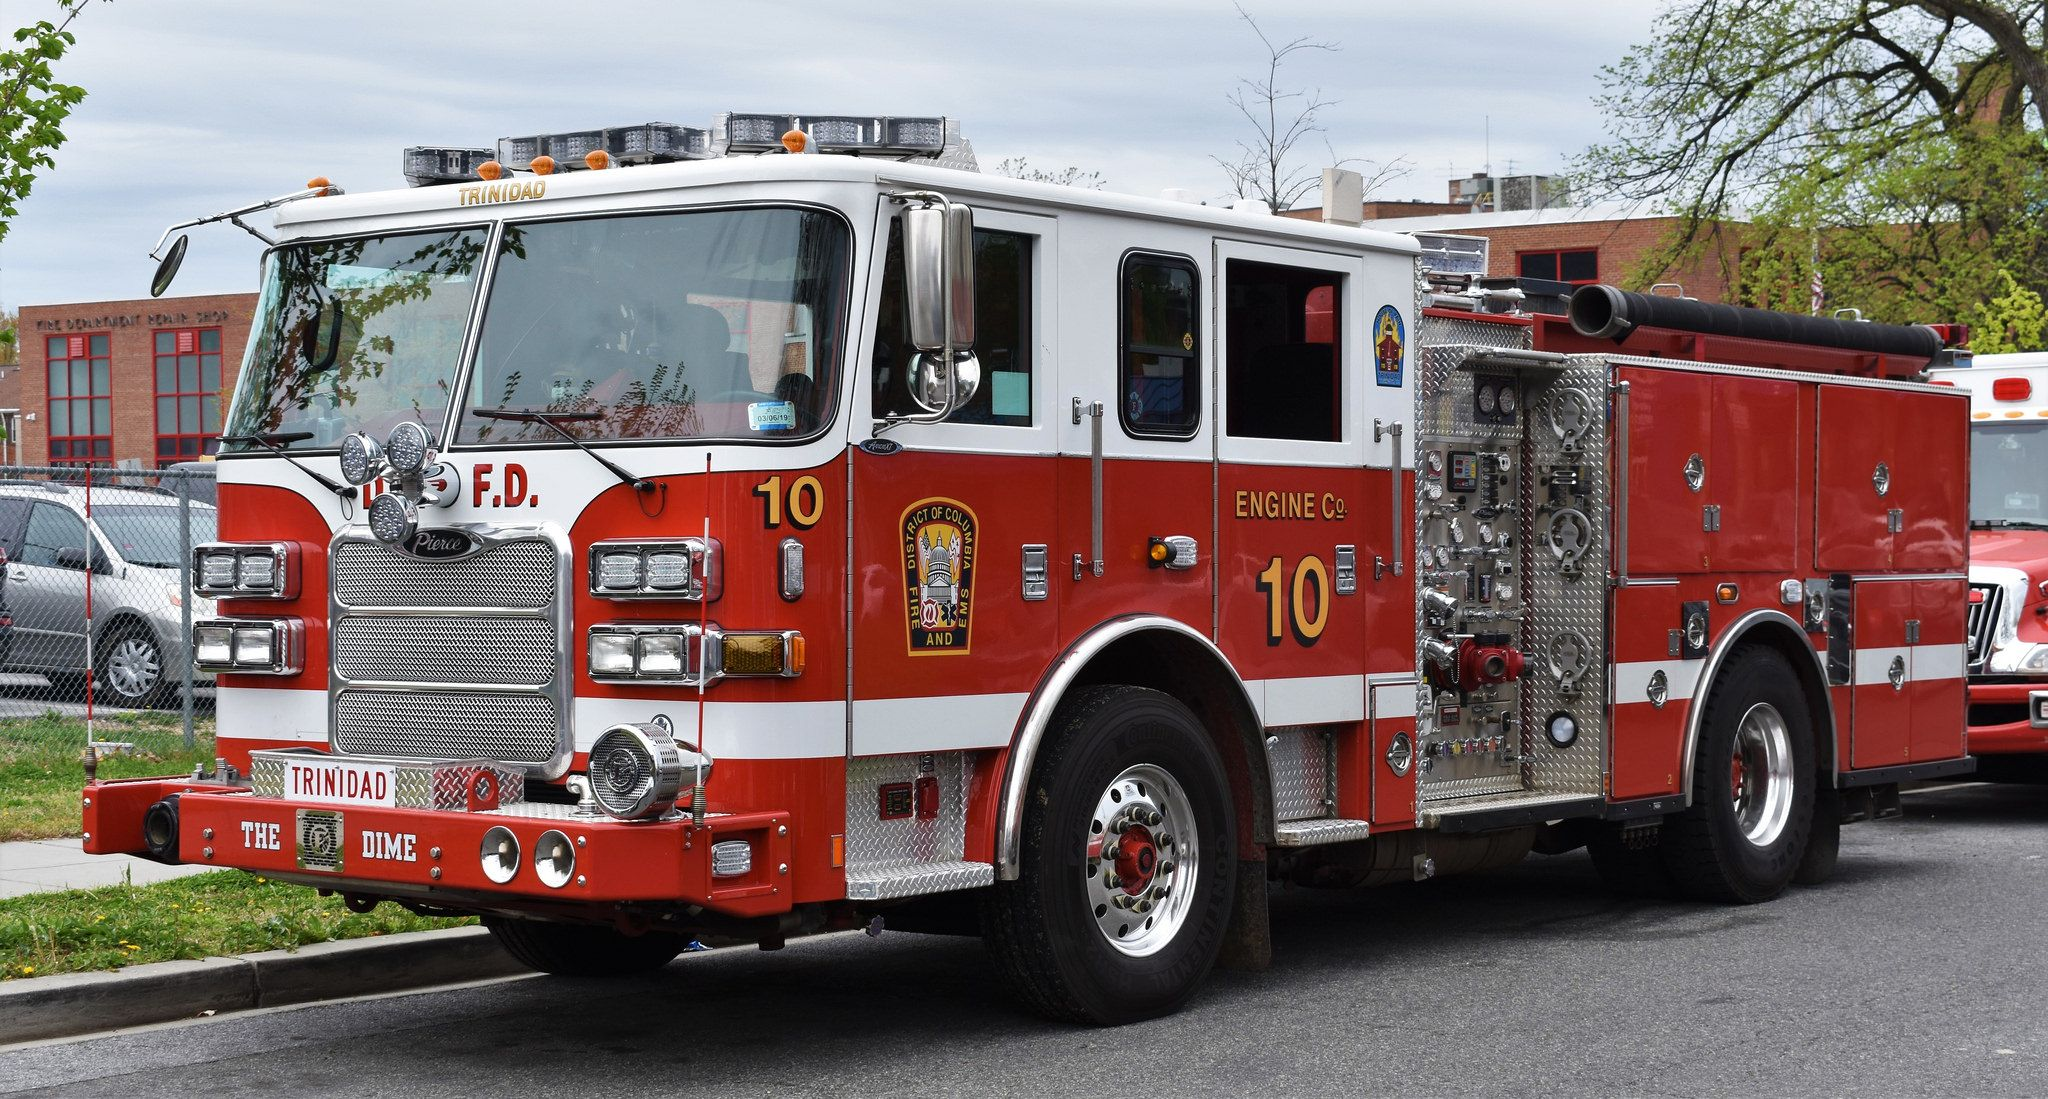 Washington D C Fire Ems Engine 10 2014 Pierce Arrow Xt Fire Trucks Engineering Emergency Service